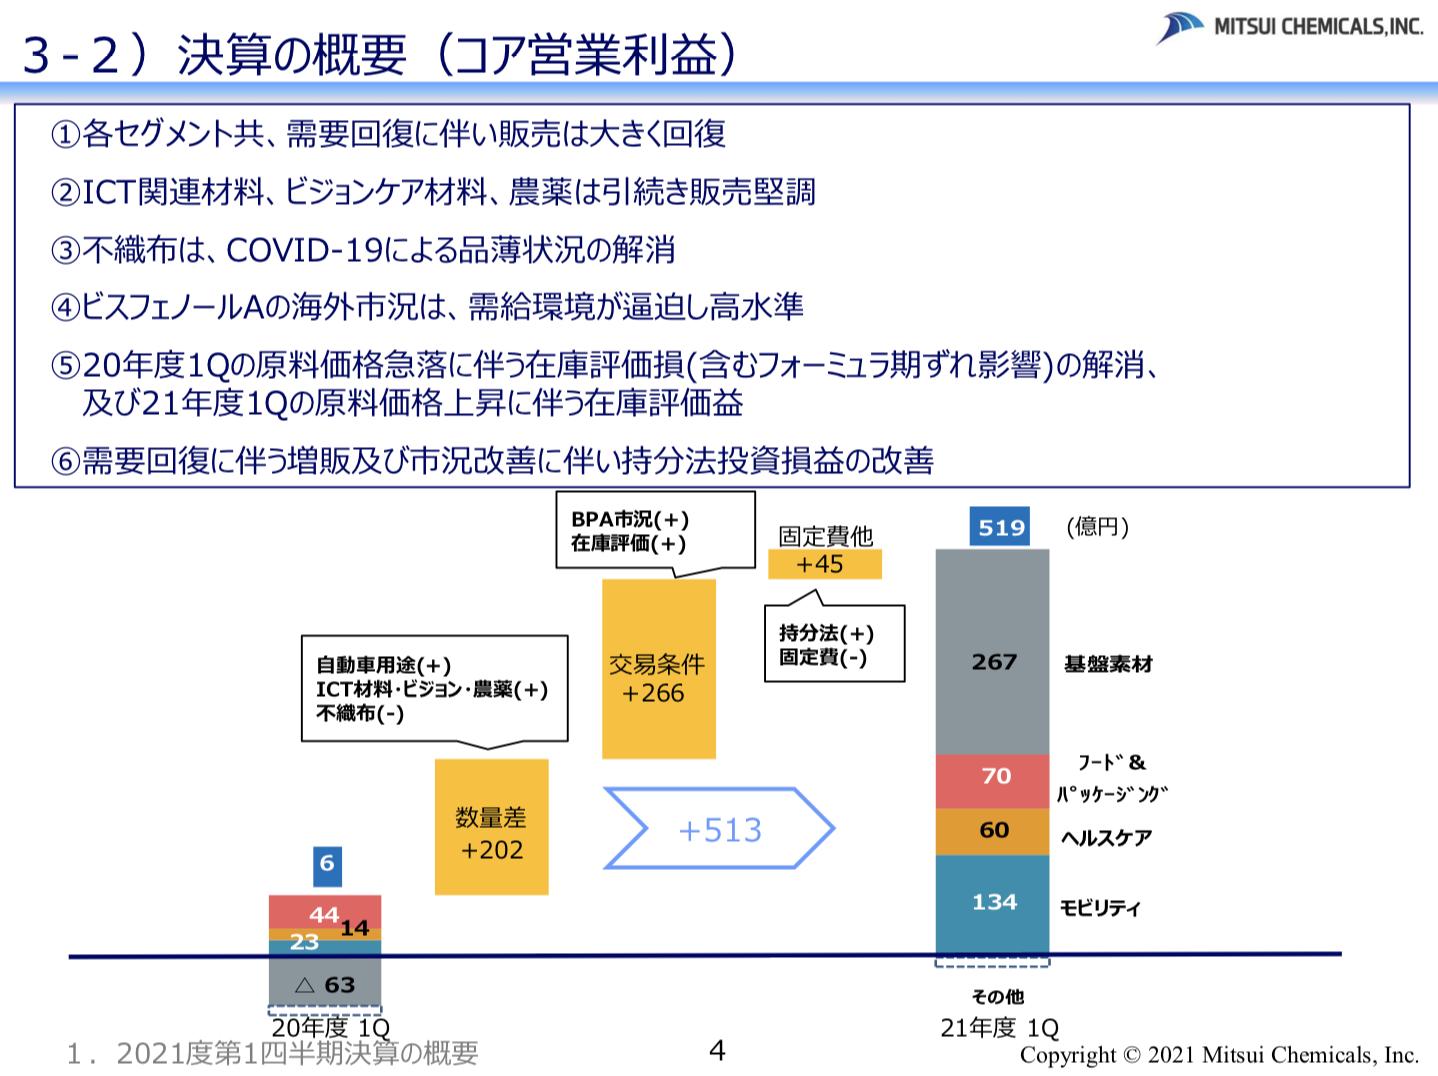 三井化学 2021年度1Q決算を徹底解説! さとり世代の株日記 資産運用 株 投資 資産形成 株式投資